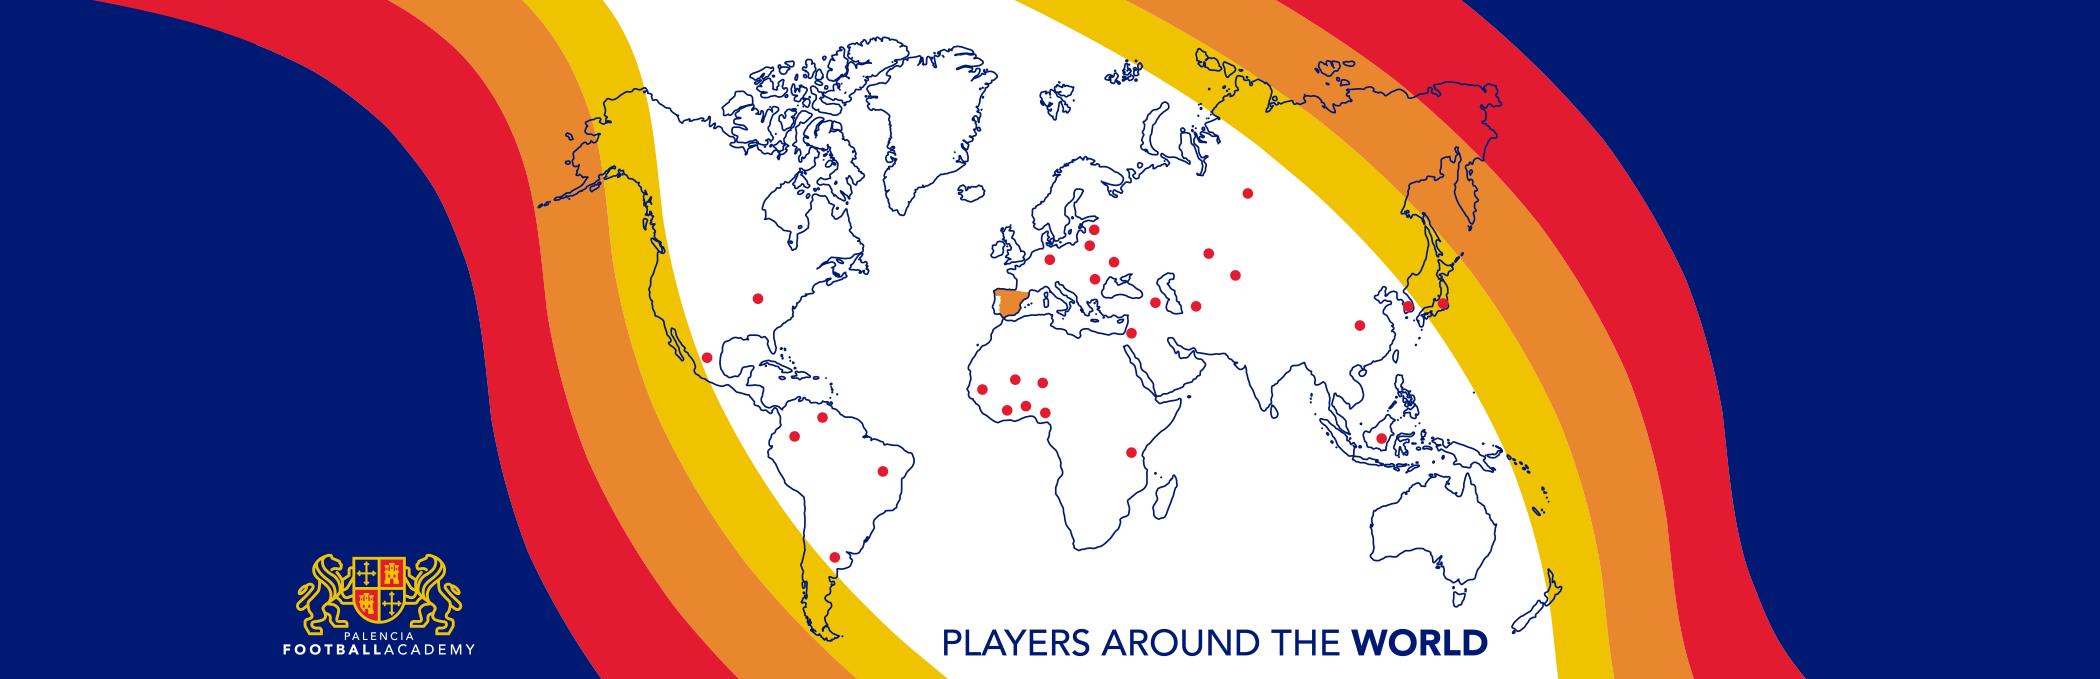 https://palenciafootballacademy.com/wp-content/uploads/2021/04/map-grandeok2.png